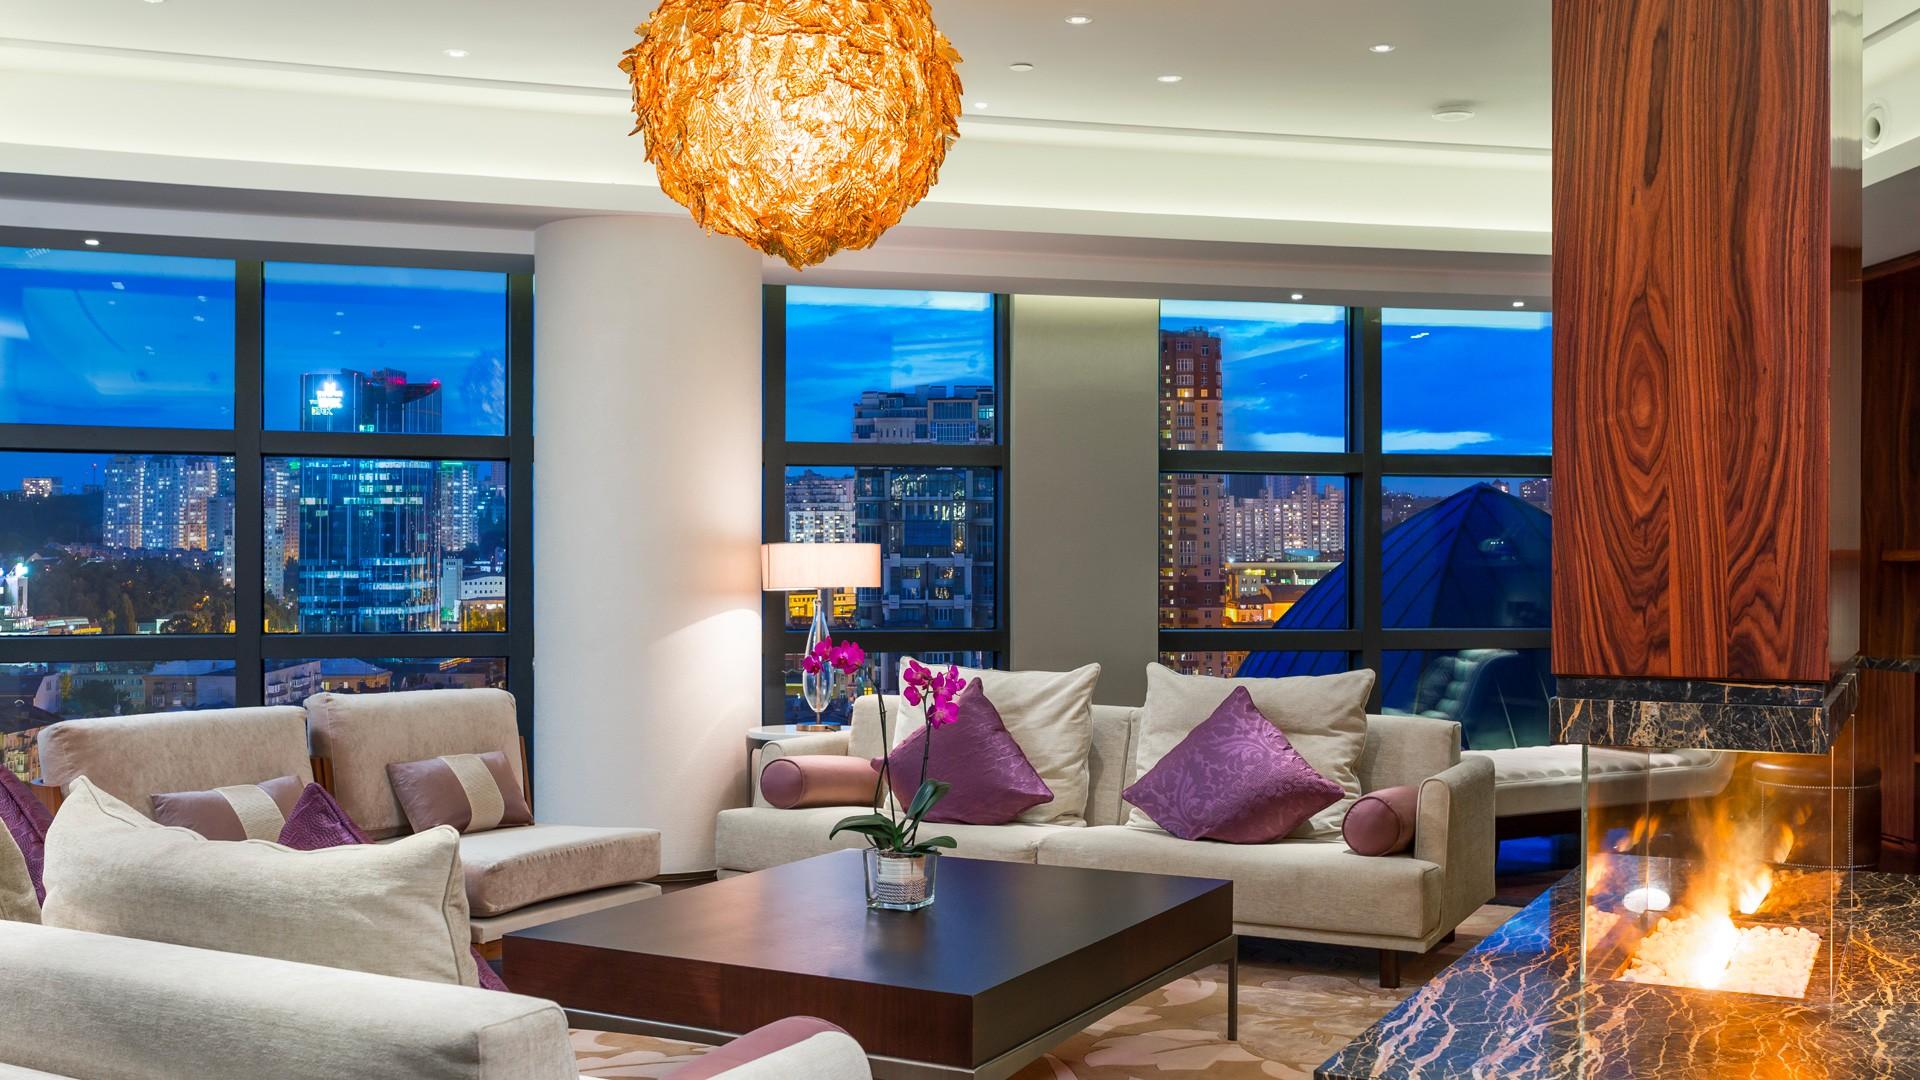 Poliform_contract_hospitality_HILTON_HOTEL_03_1920x1080px